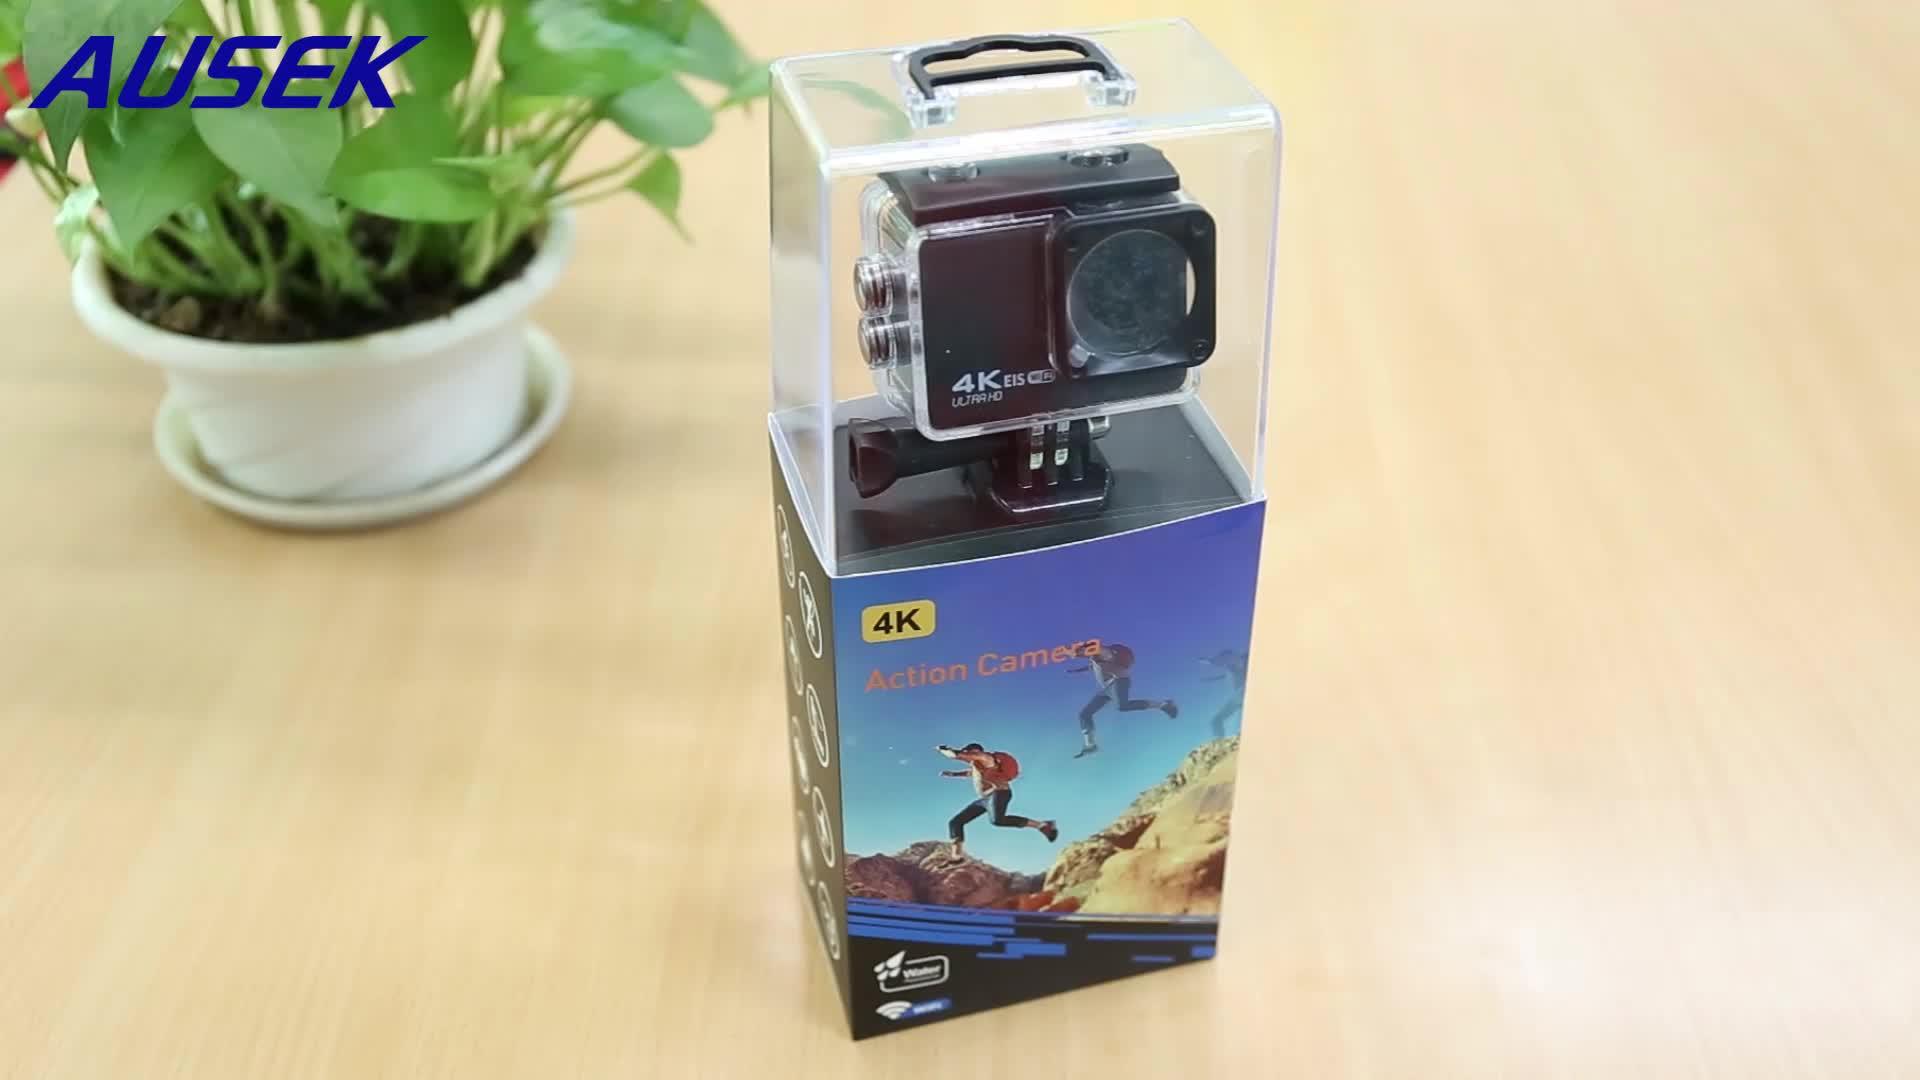 2020 Новый высокое качество akaso ek7000 Спортивная камера 4K wifi Водонепроницаемая цифровая 20MP EIS видео камера мотоцикл камера